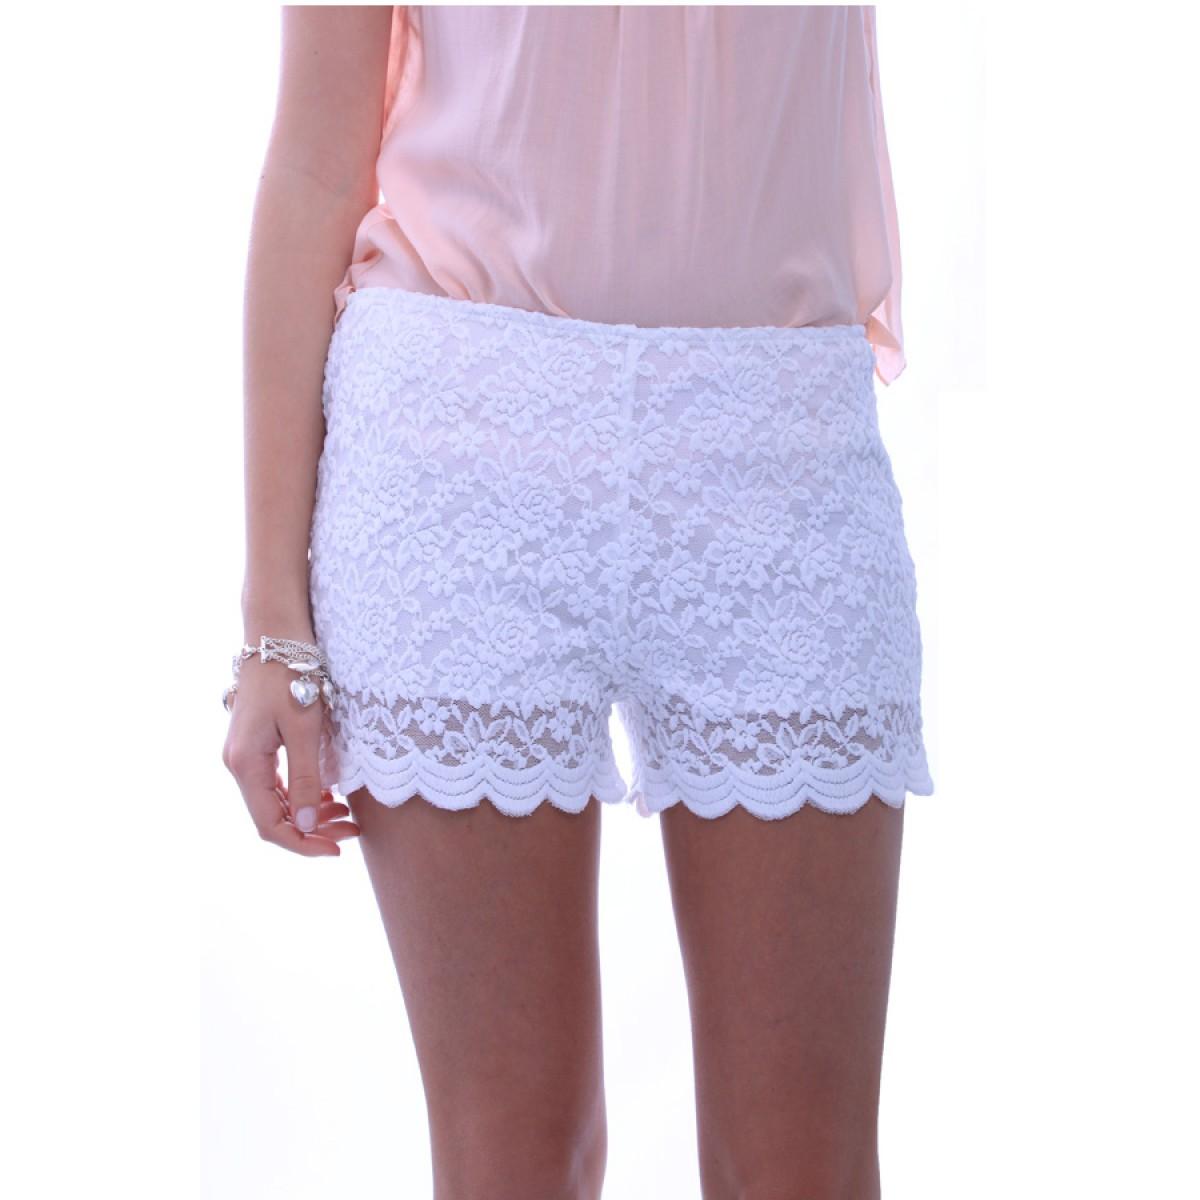 Lace Shorts - Oa Uvw I